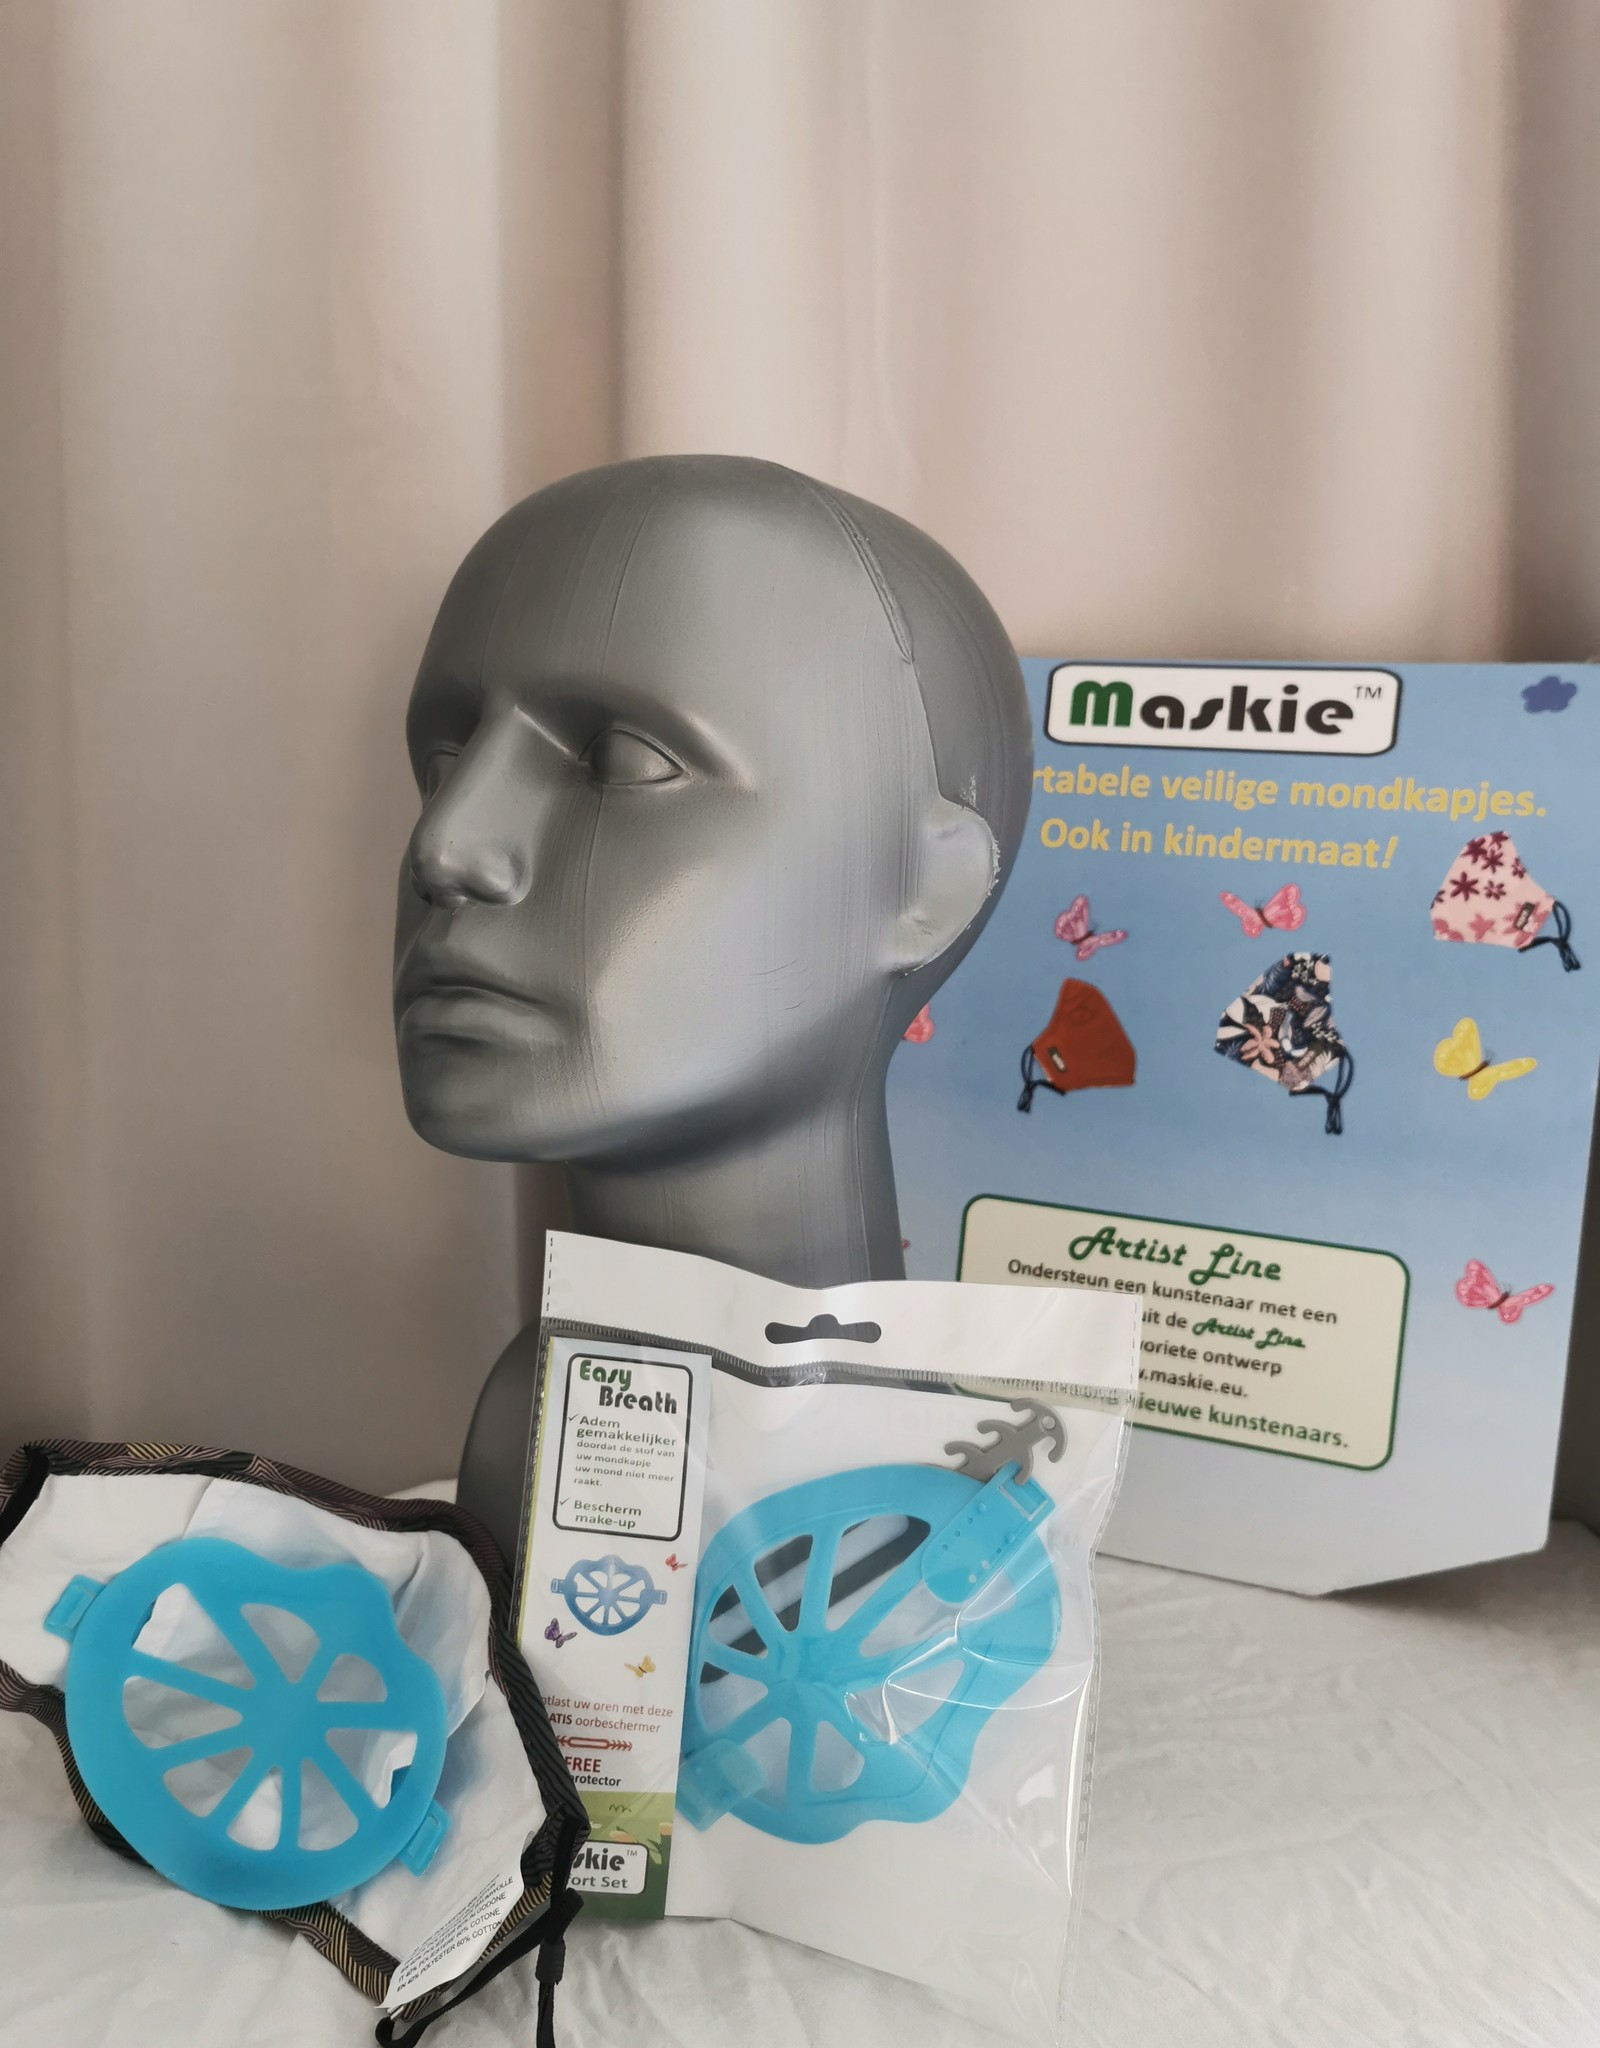 Ensemble confort de masque facial pour une respiration facile